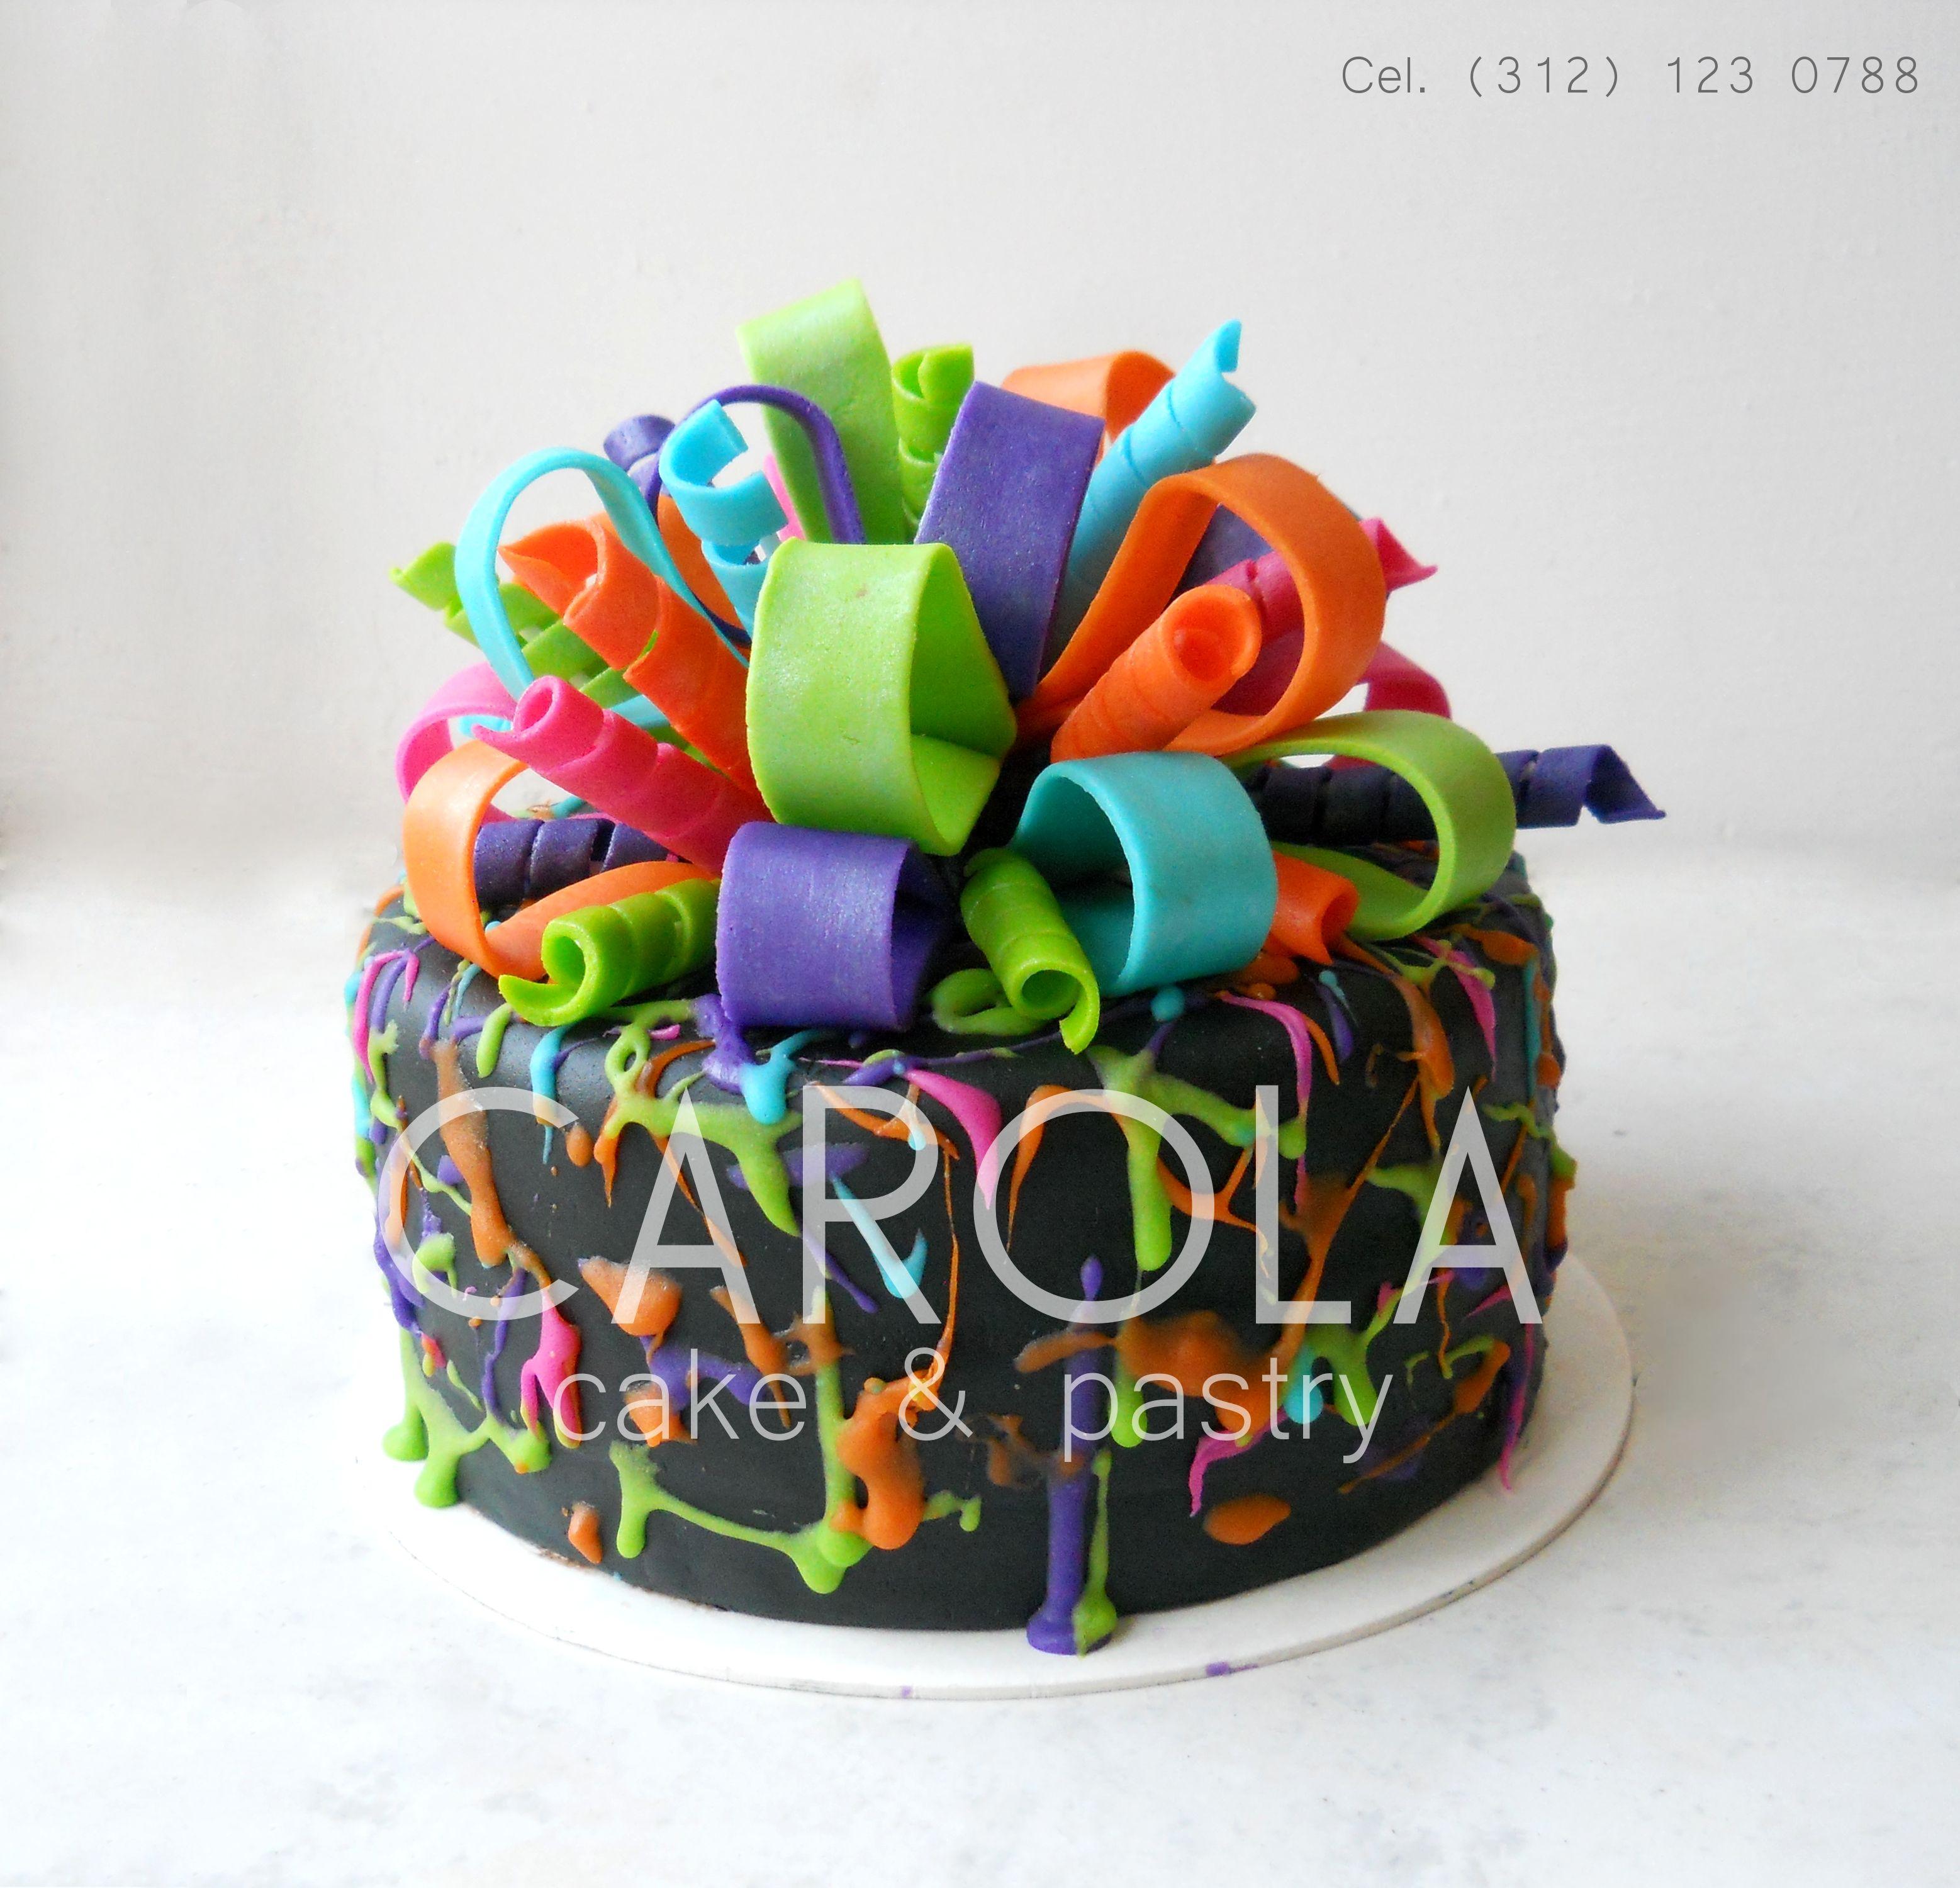 T Cake Festeja Con Este Divertido Pastel De Fondant Tu